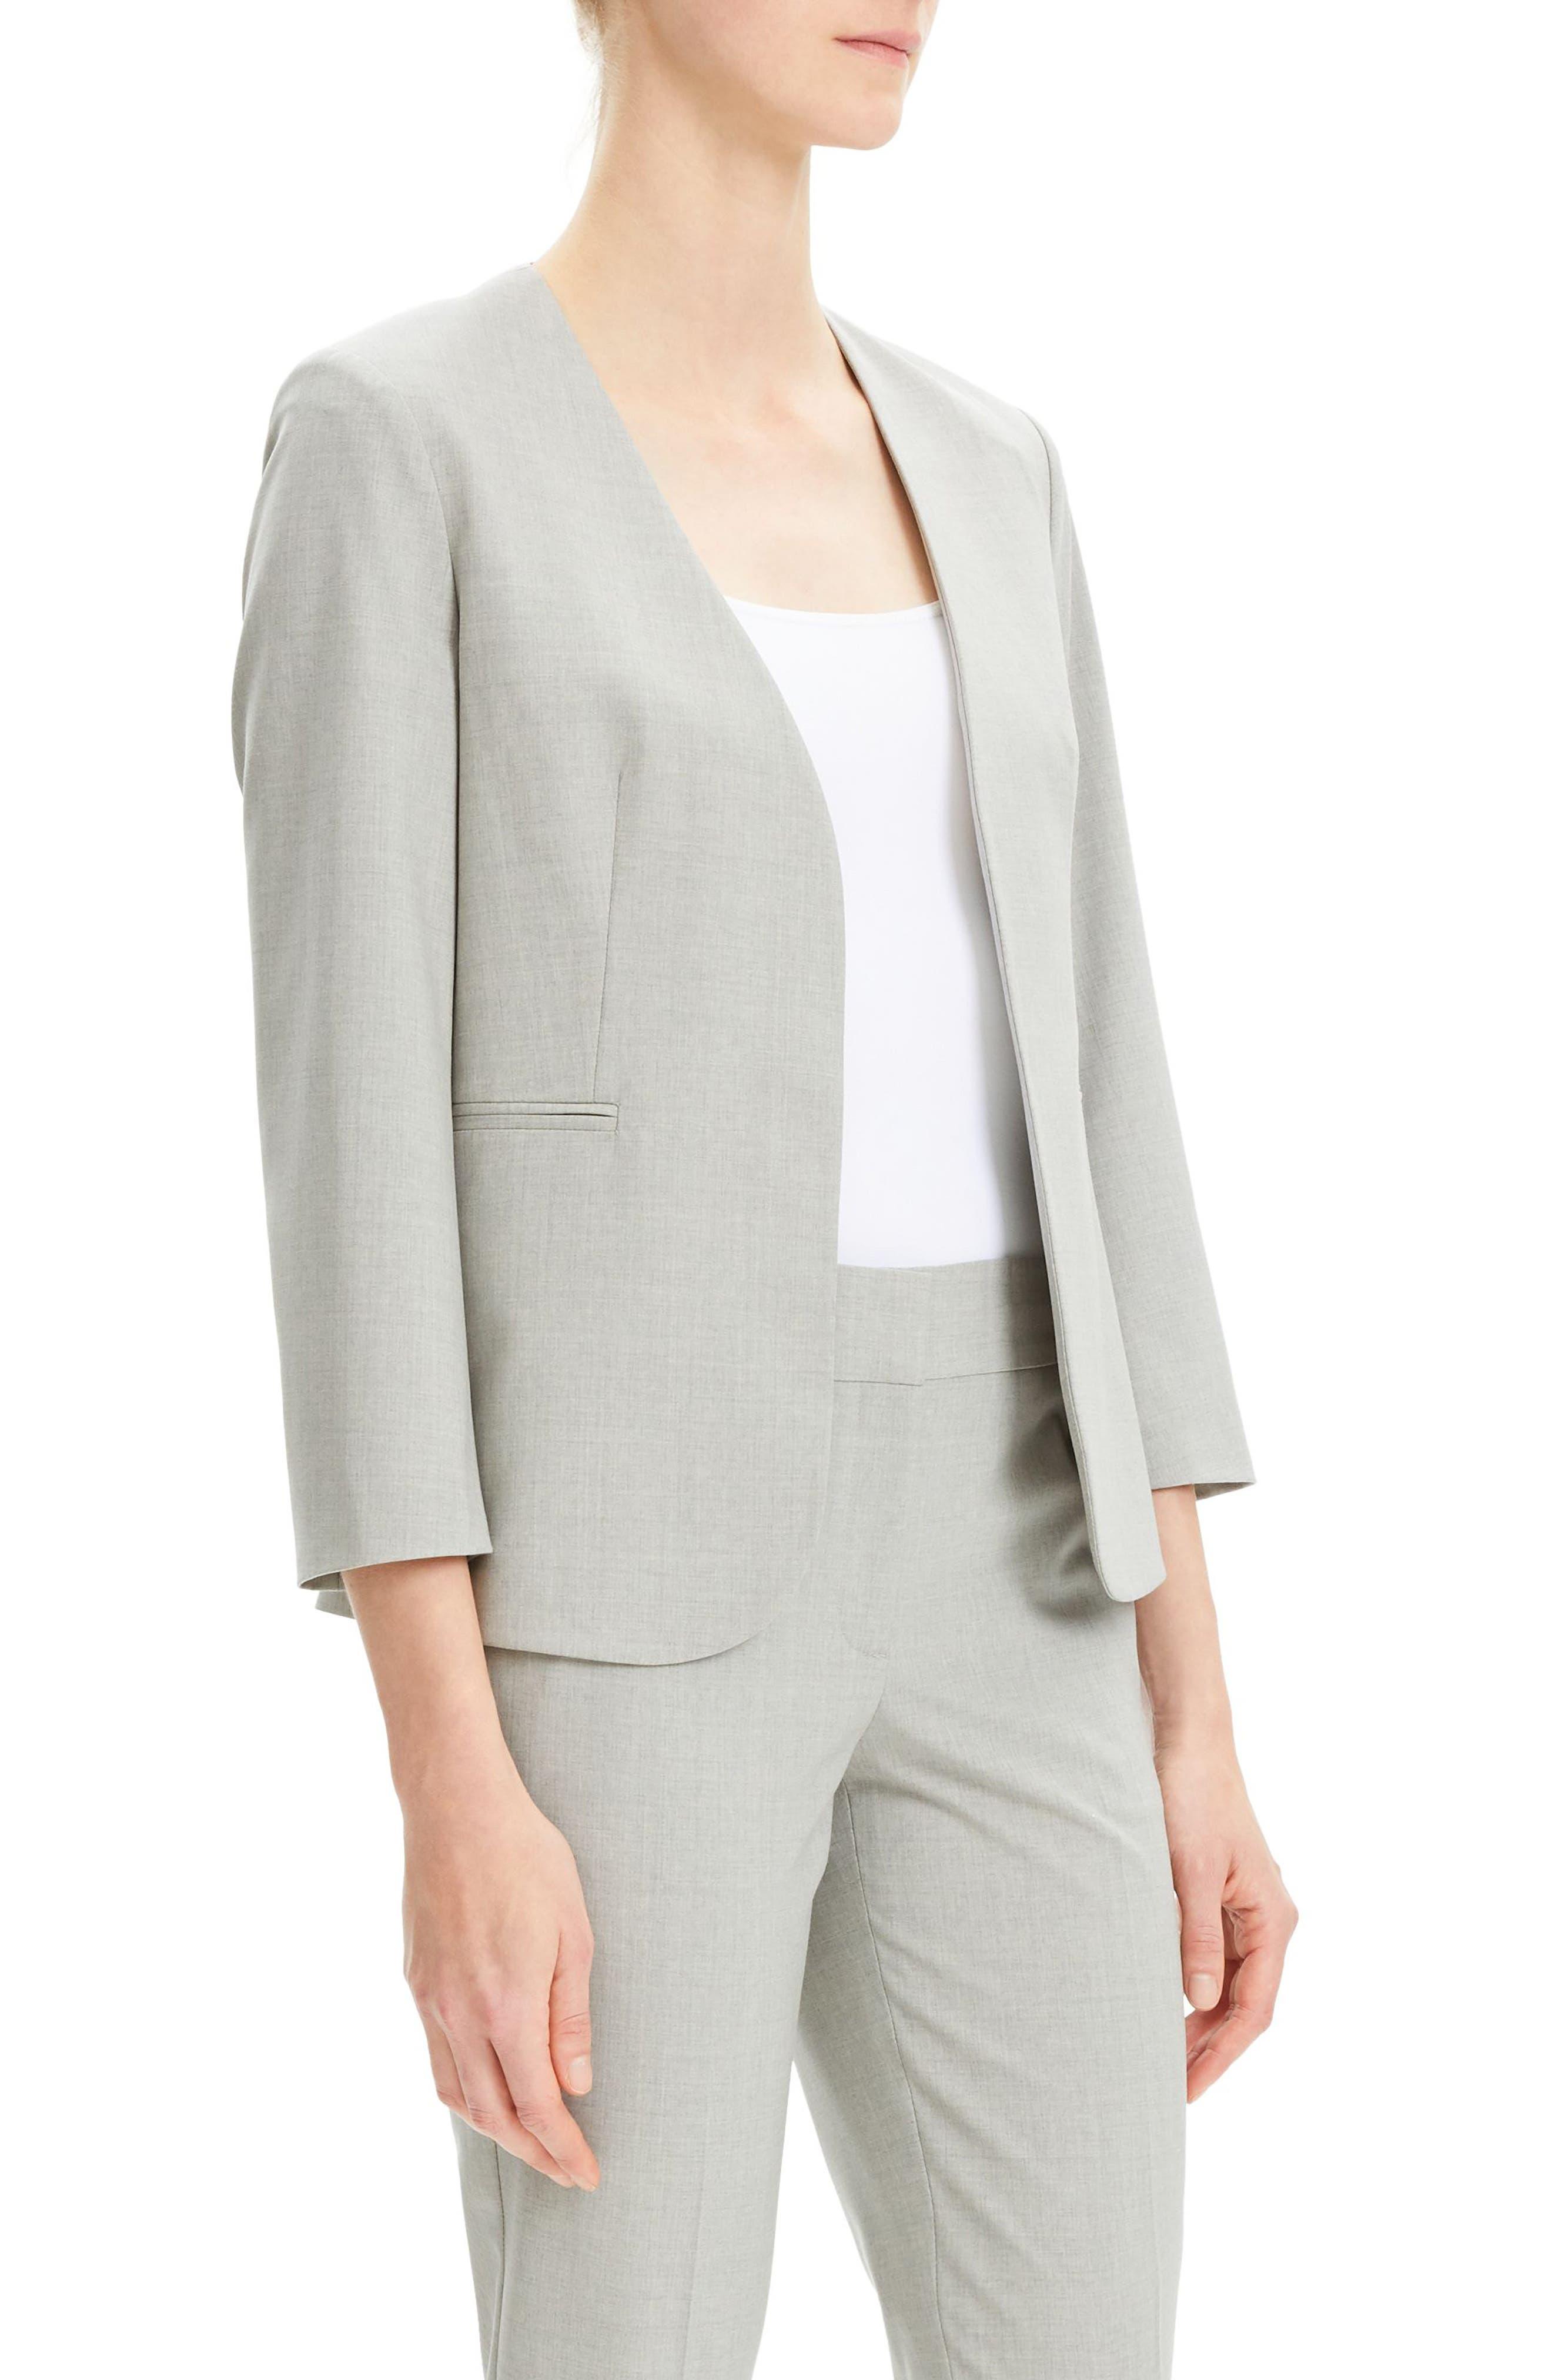 THEORY, Lindrayia B Good Wool Suit Jacket, Alternate thumbnail 4, color, LIGHT GREY MELANGE